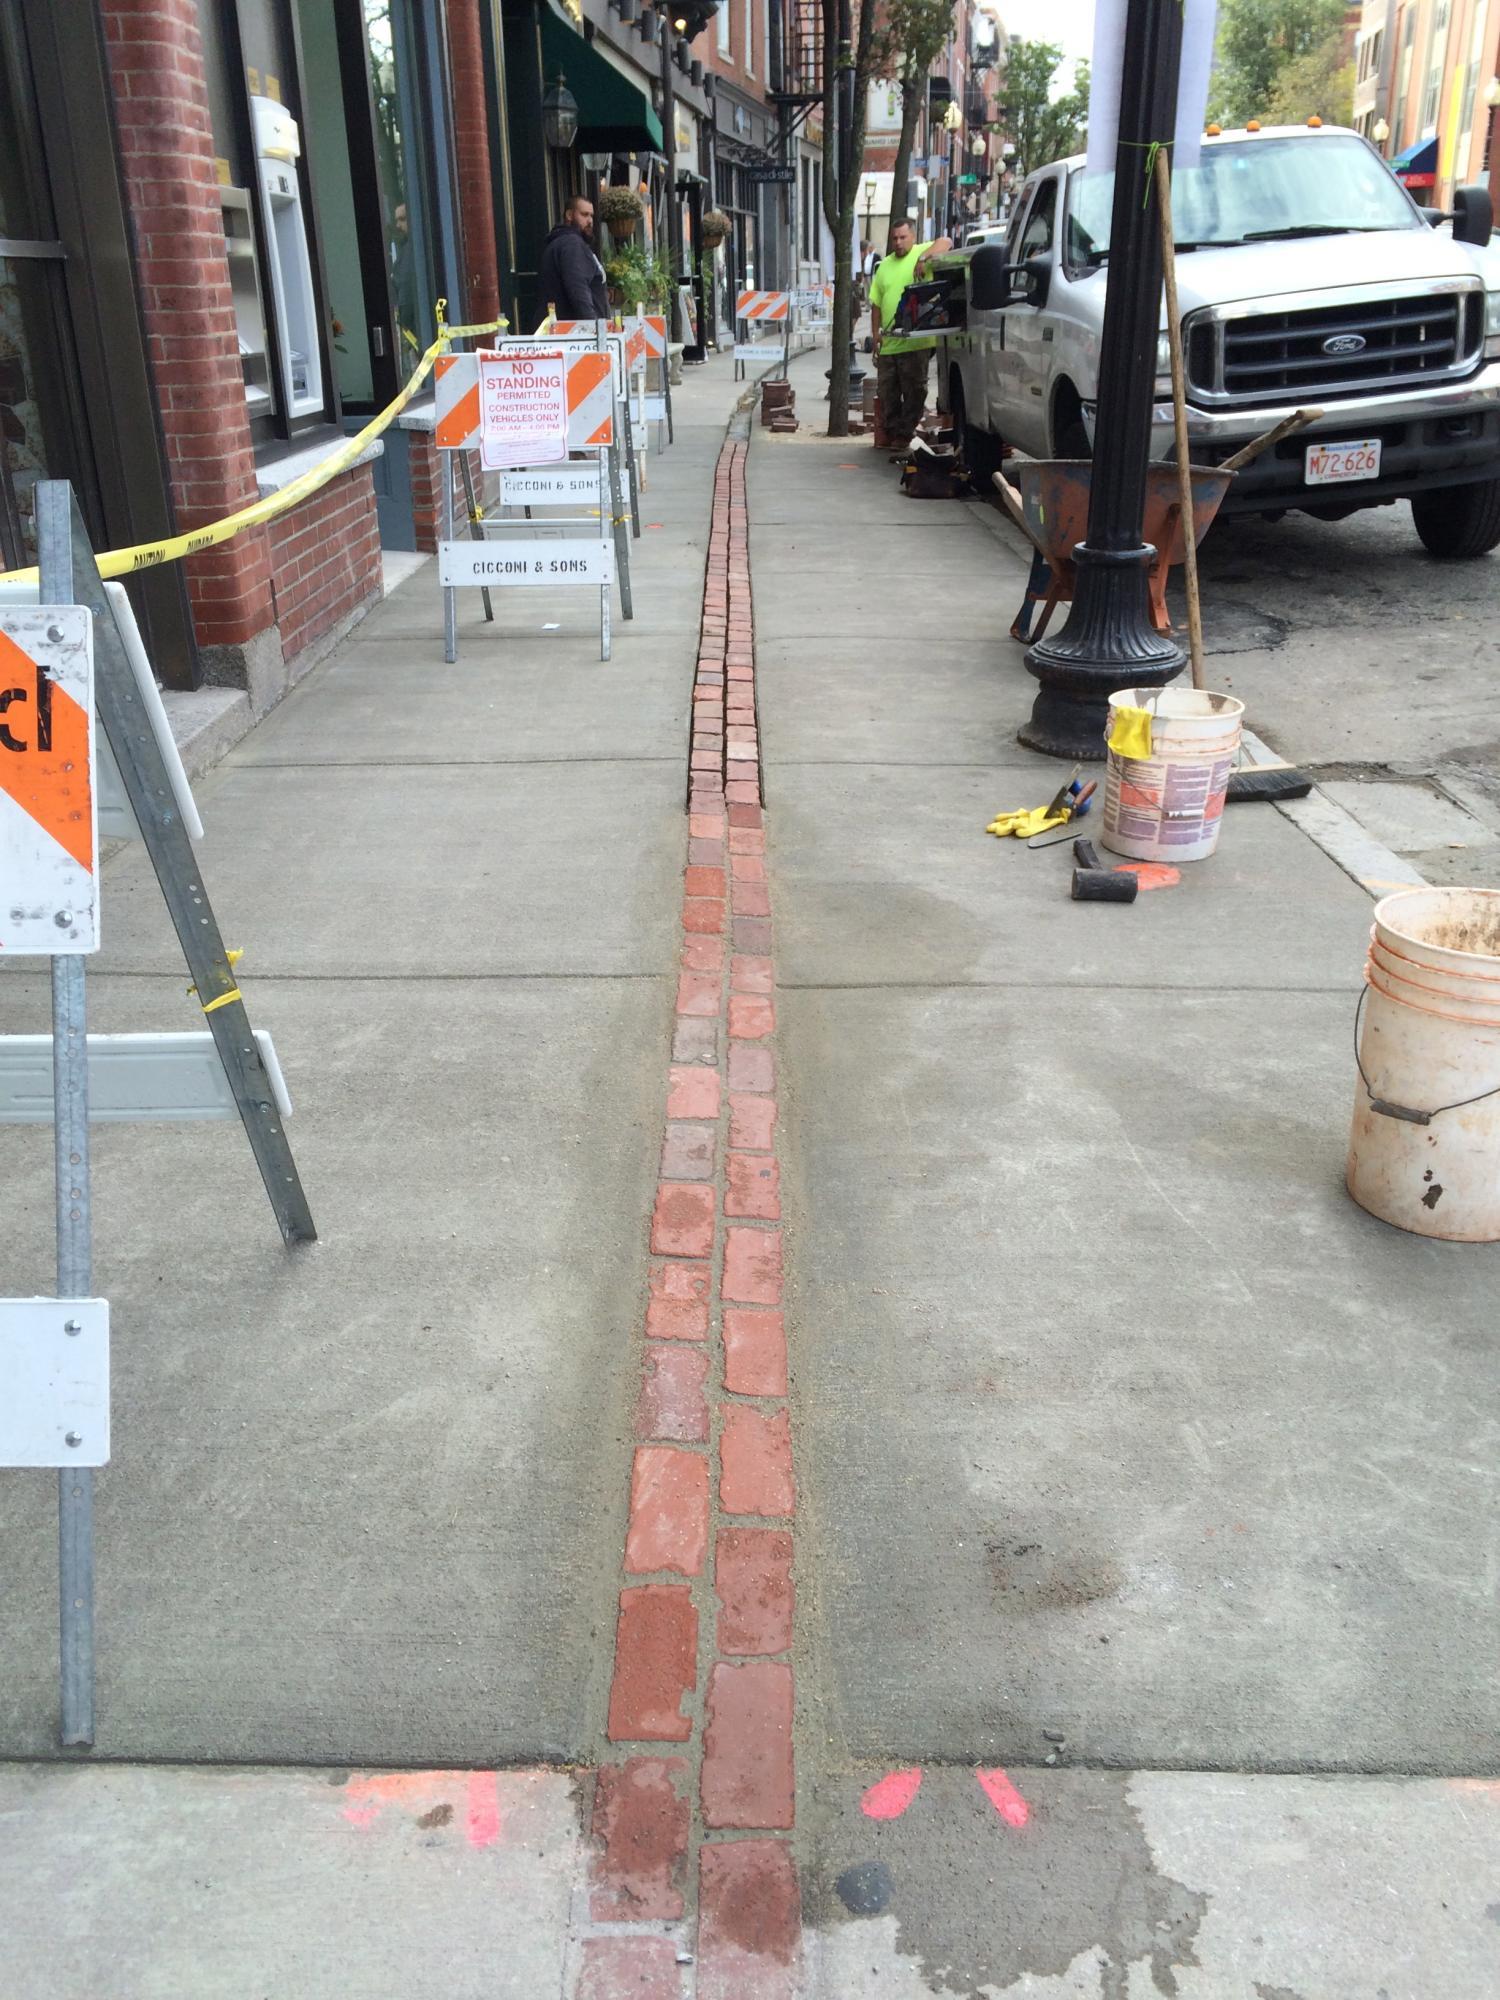 Freedom Trail work on Hanover St.